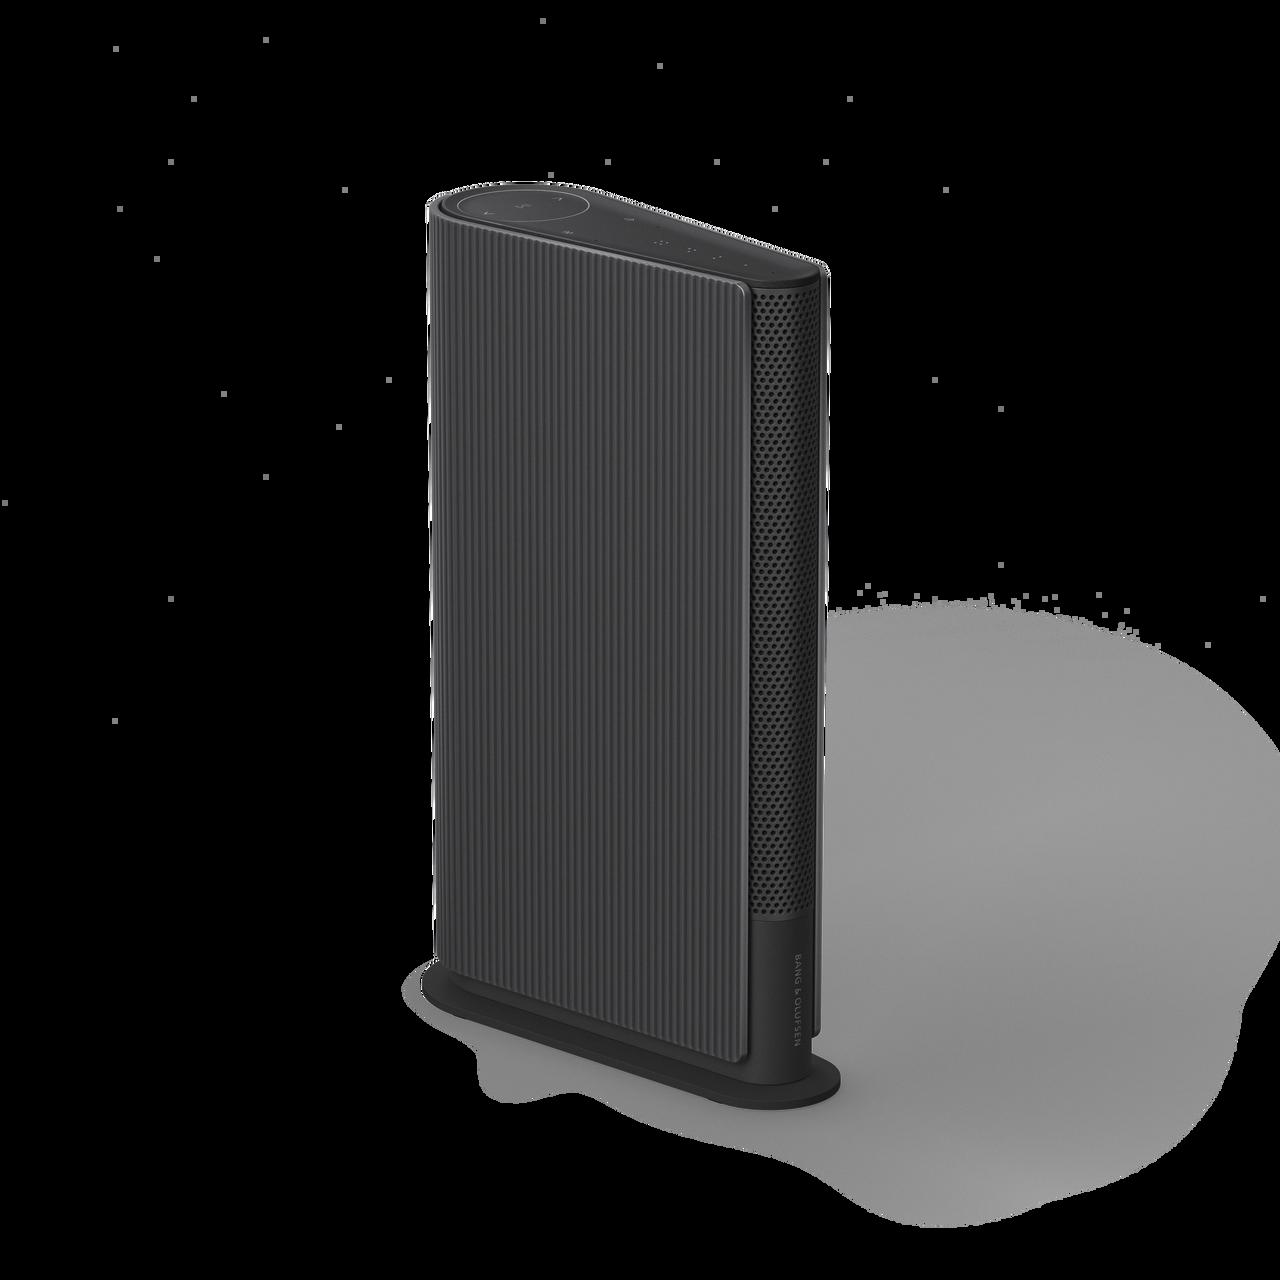 BEOSOUND EMERGE - Black Anthracite